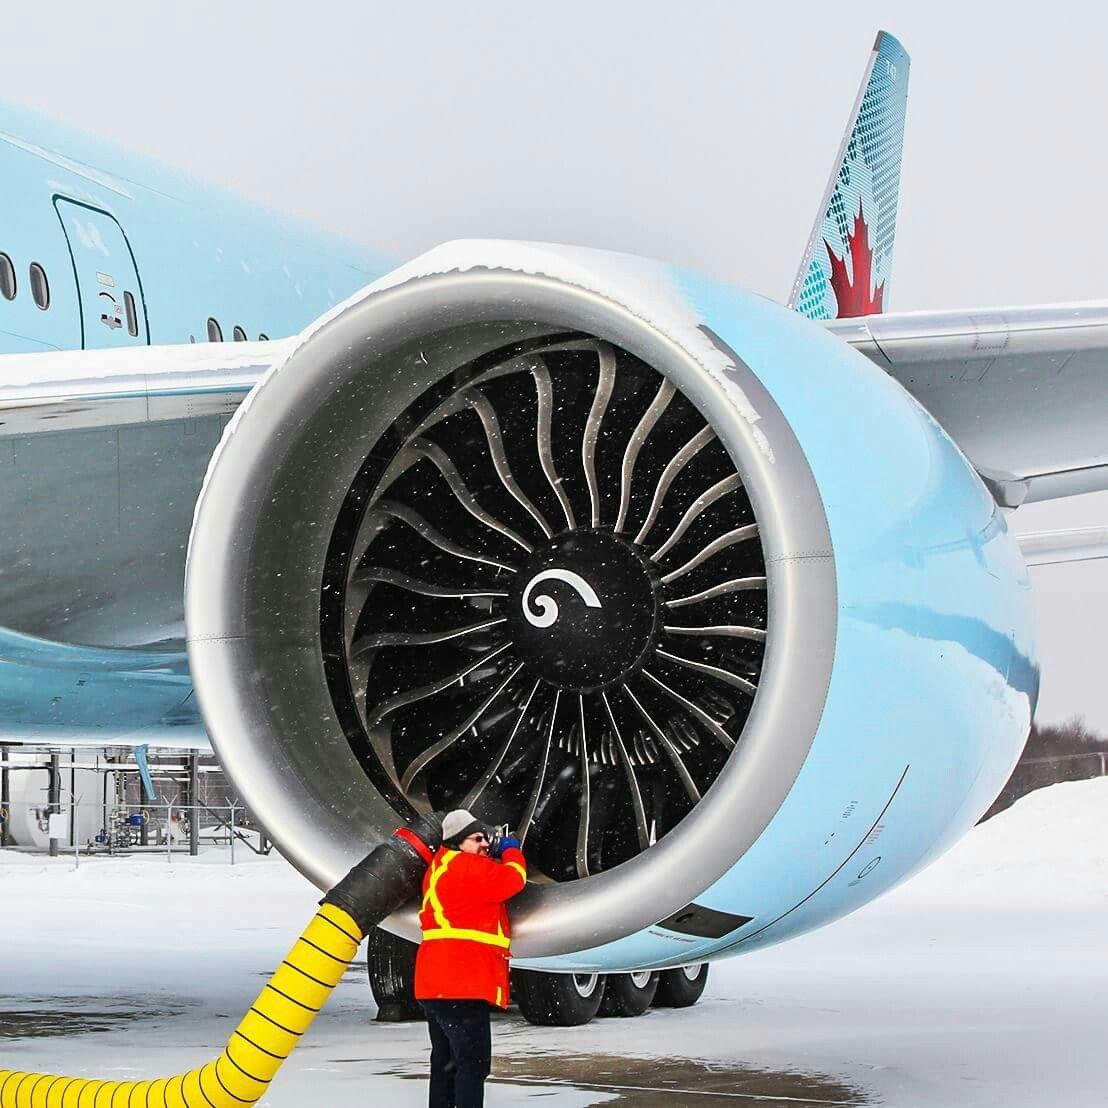 De Icing The Ge90 115b Engine Of An Air Canada 777 300er Aviones De Combate Aviones Turbinas Avion